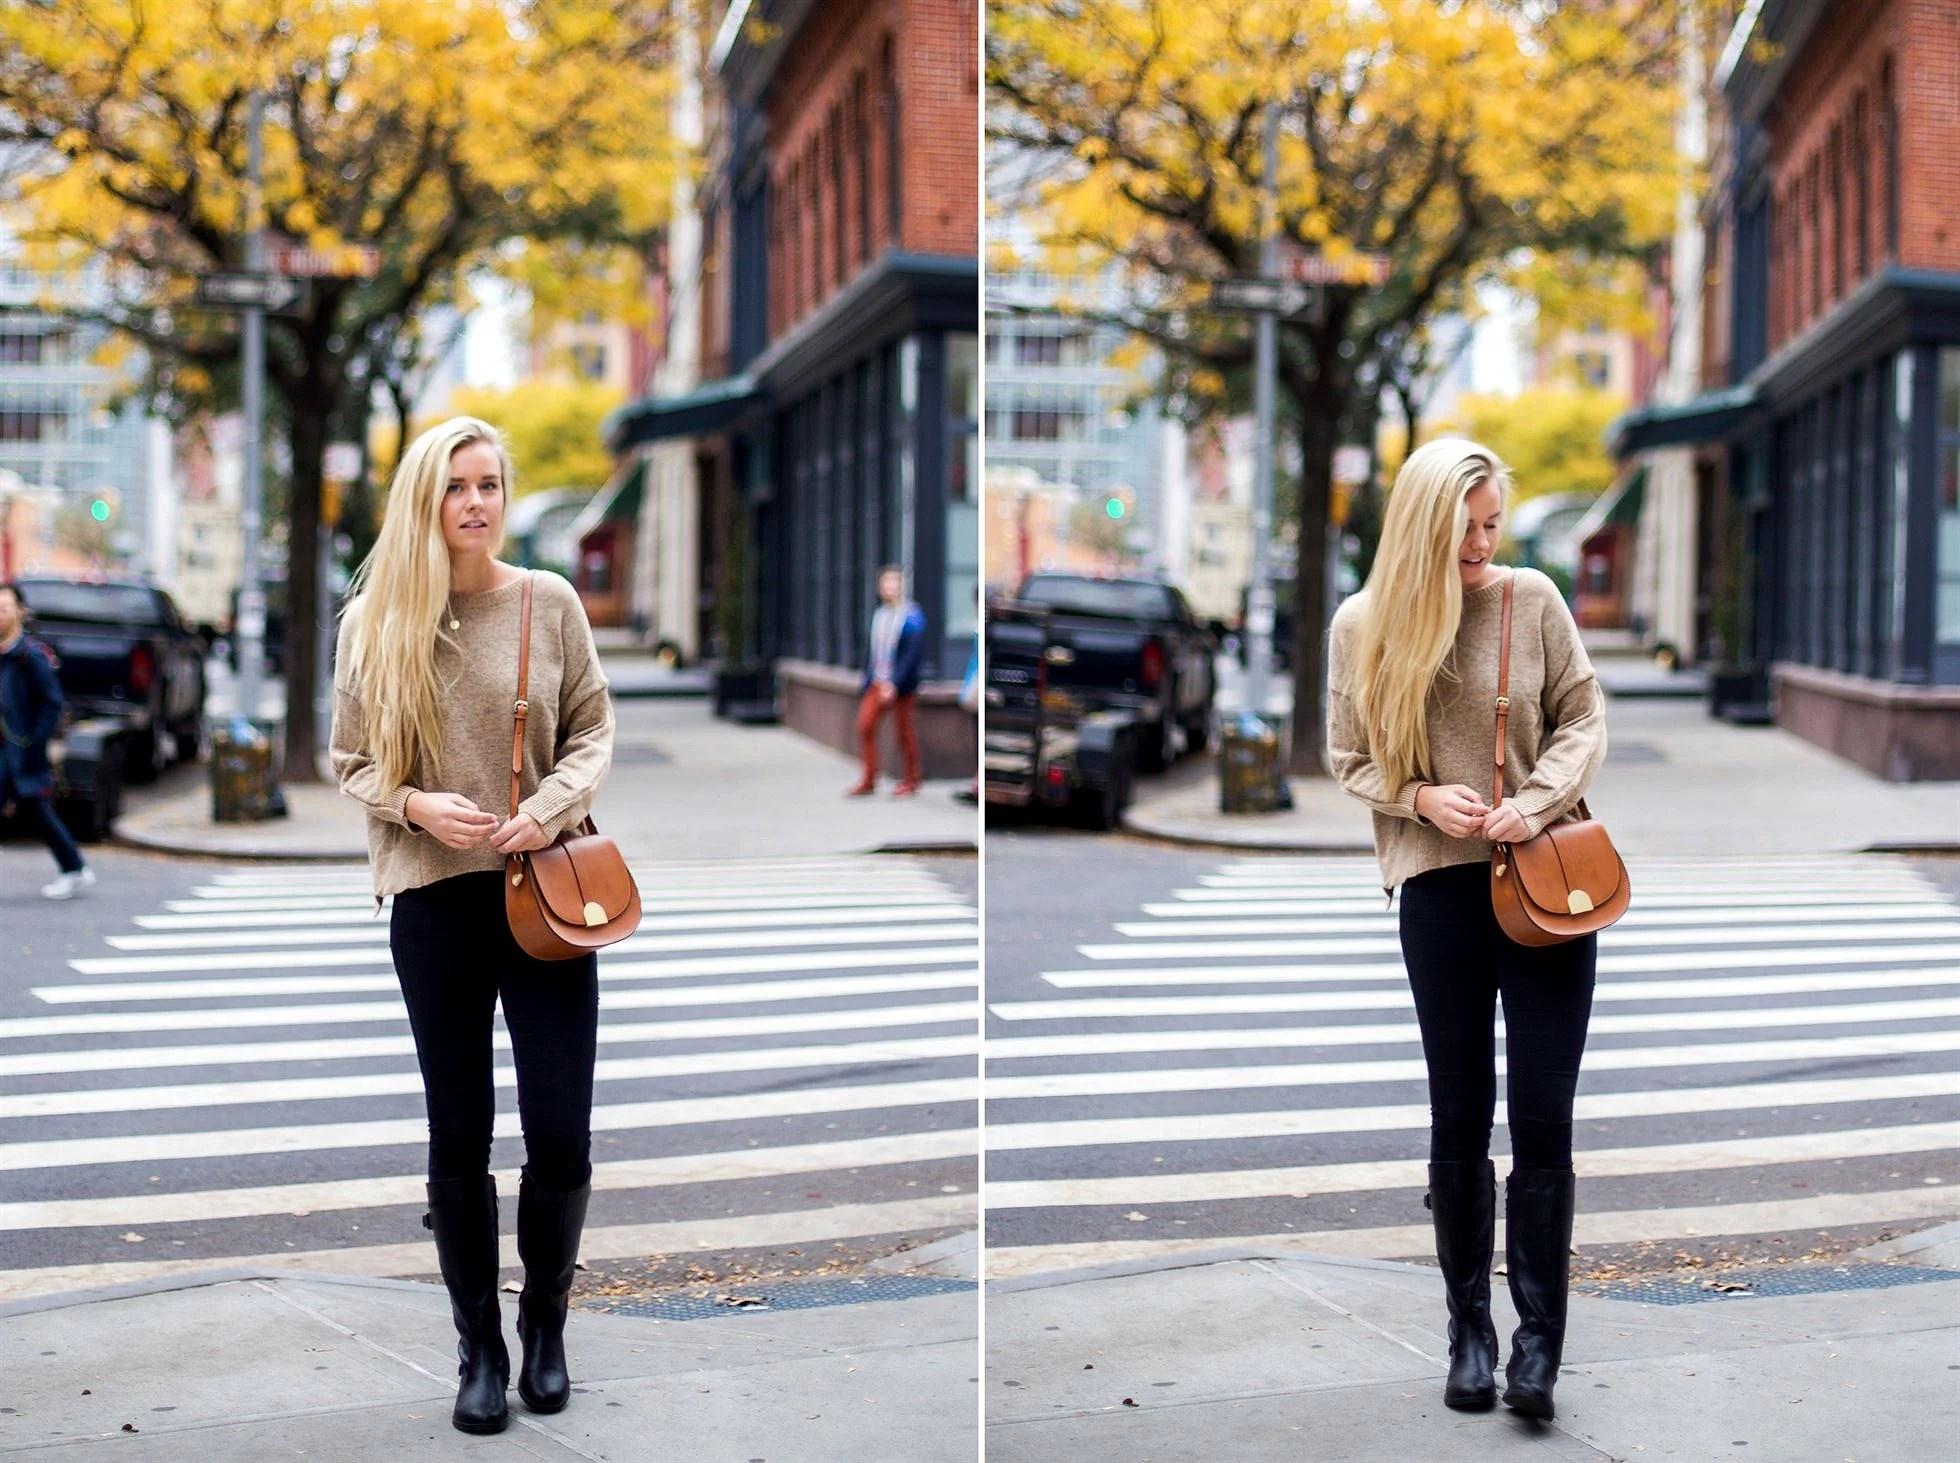 Outfits November 2015